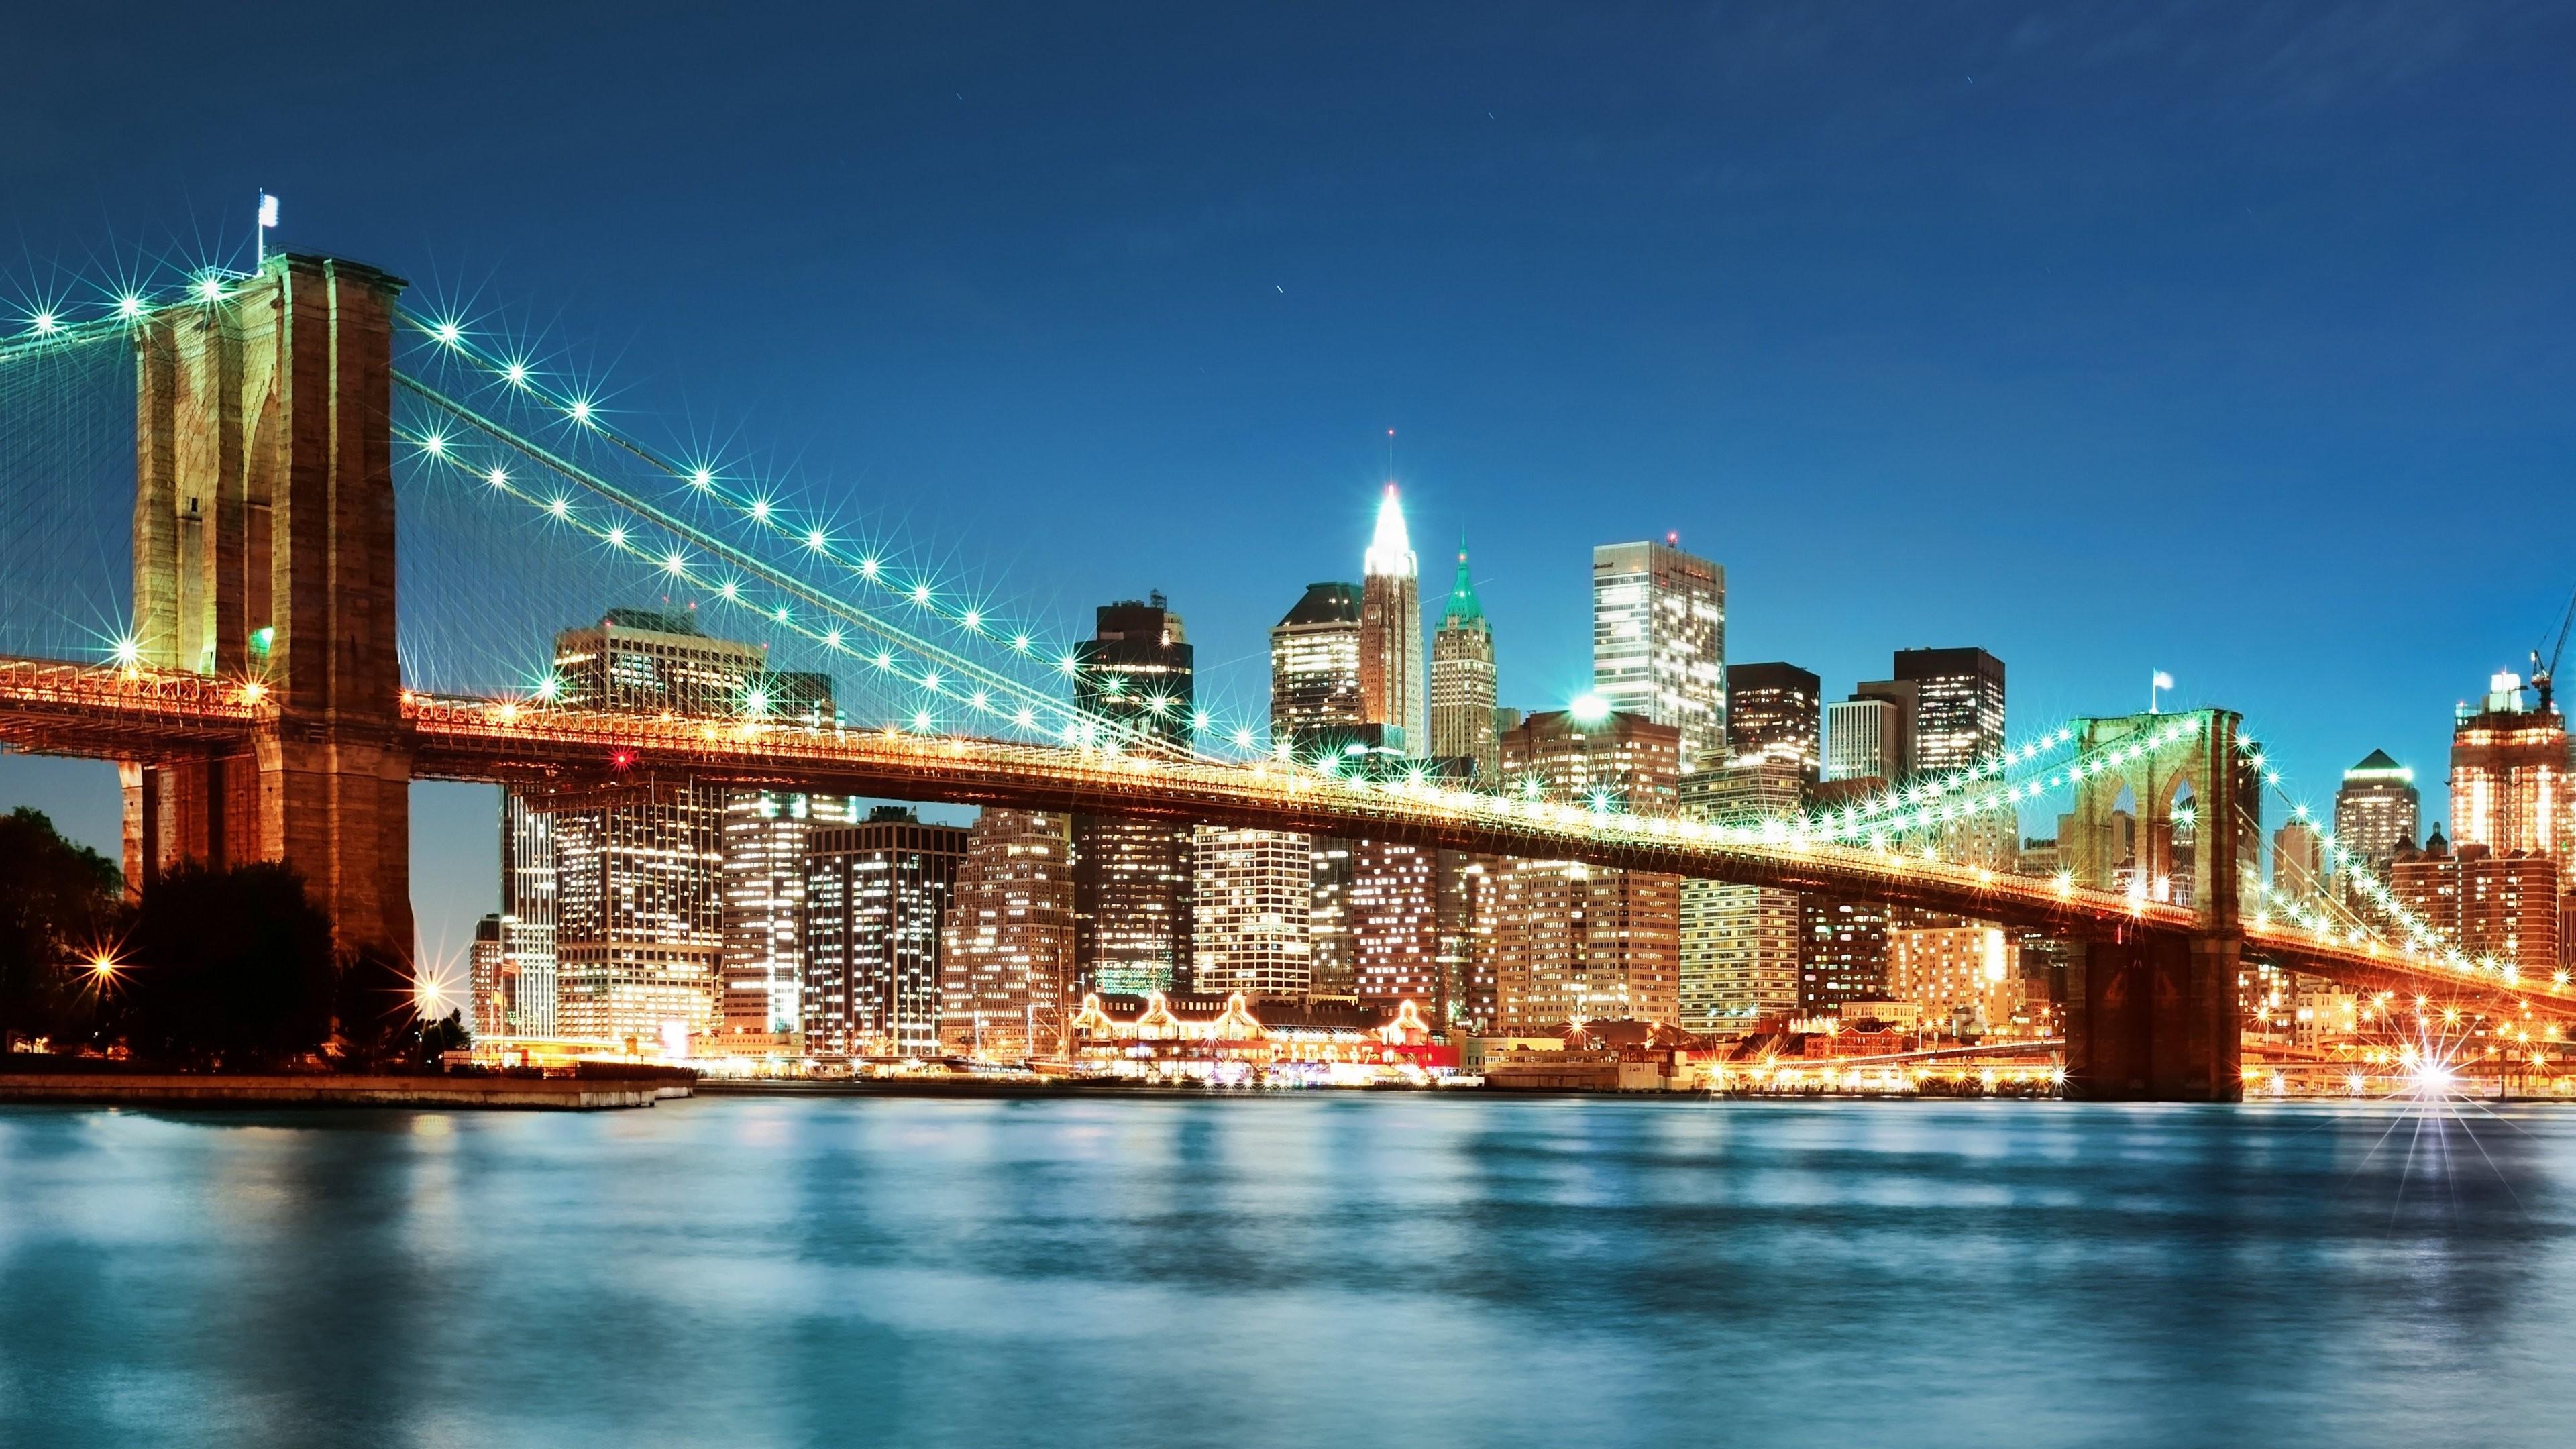 Bridge Buildings City Lights New York Night Time River Skyscrapers …